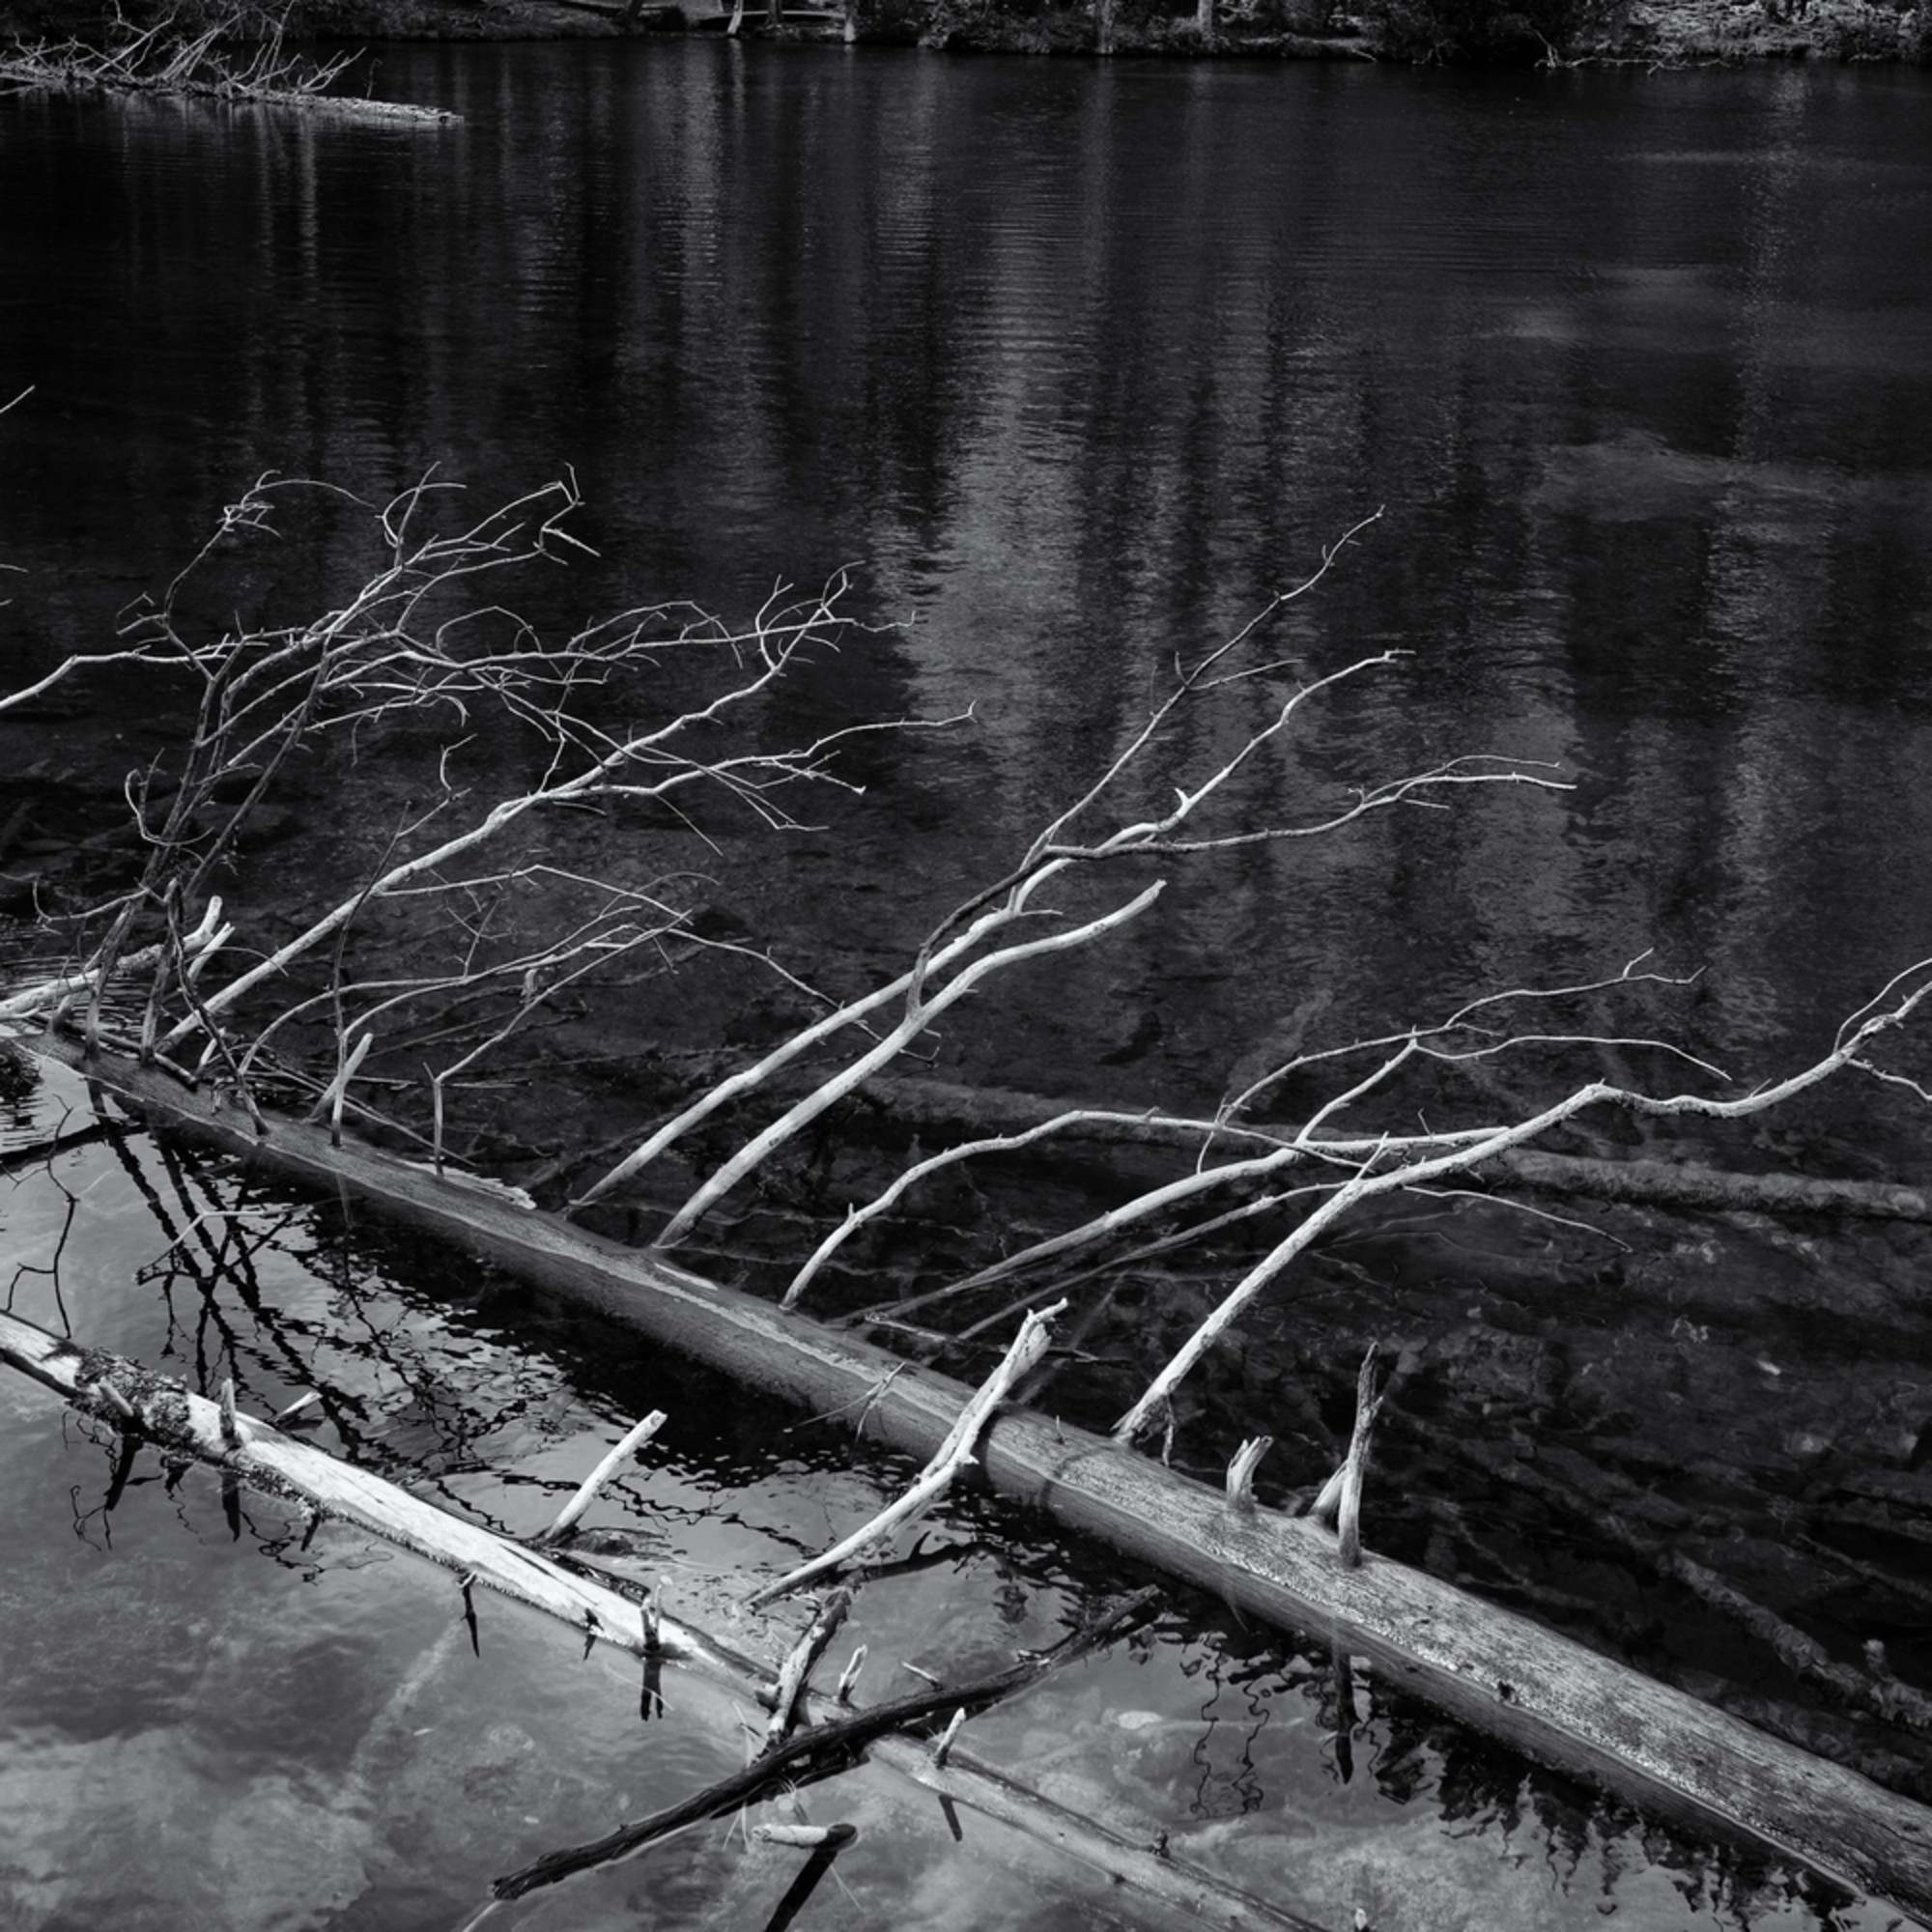 Grassi lakes british columbia qwg8dh